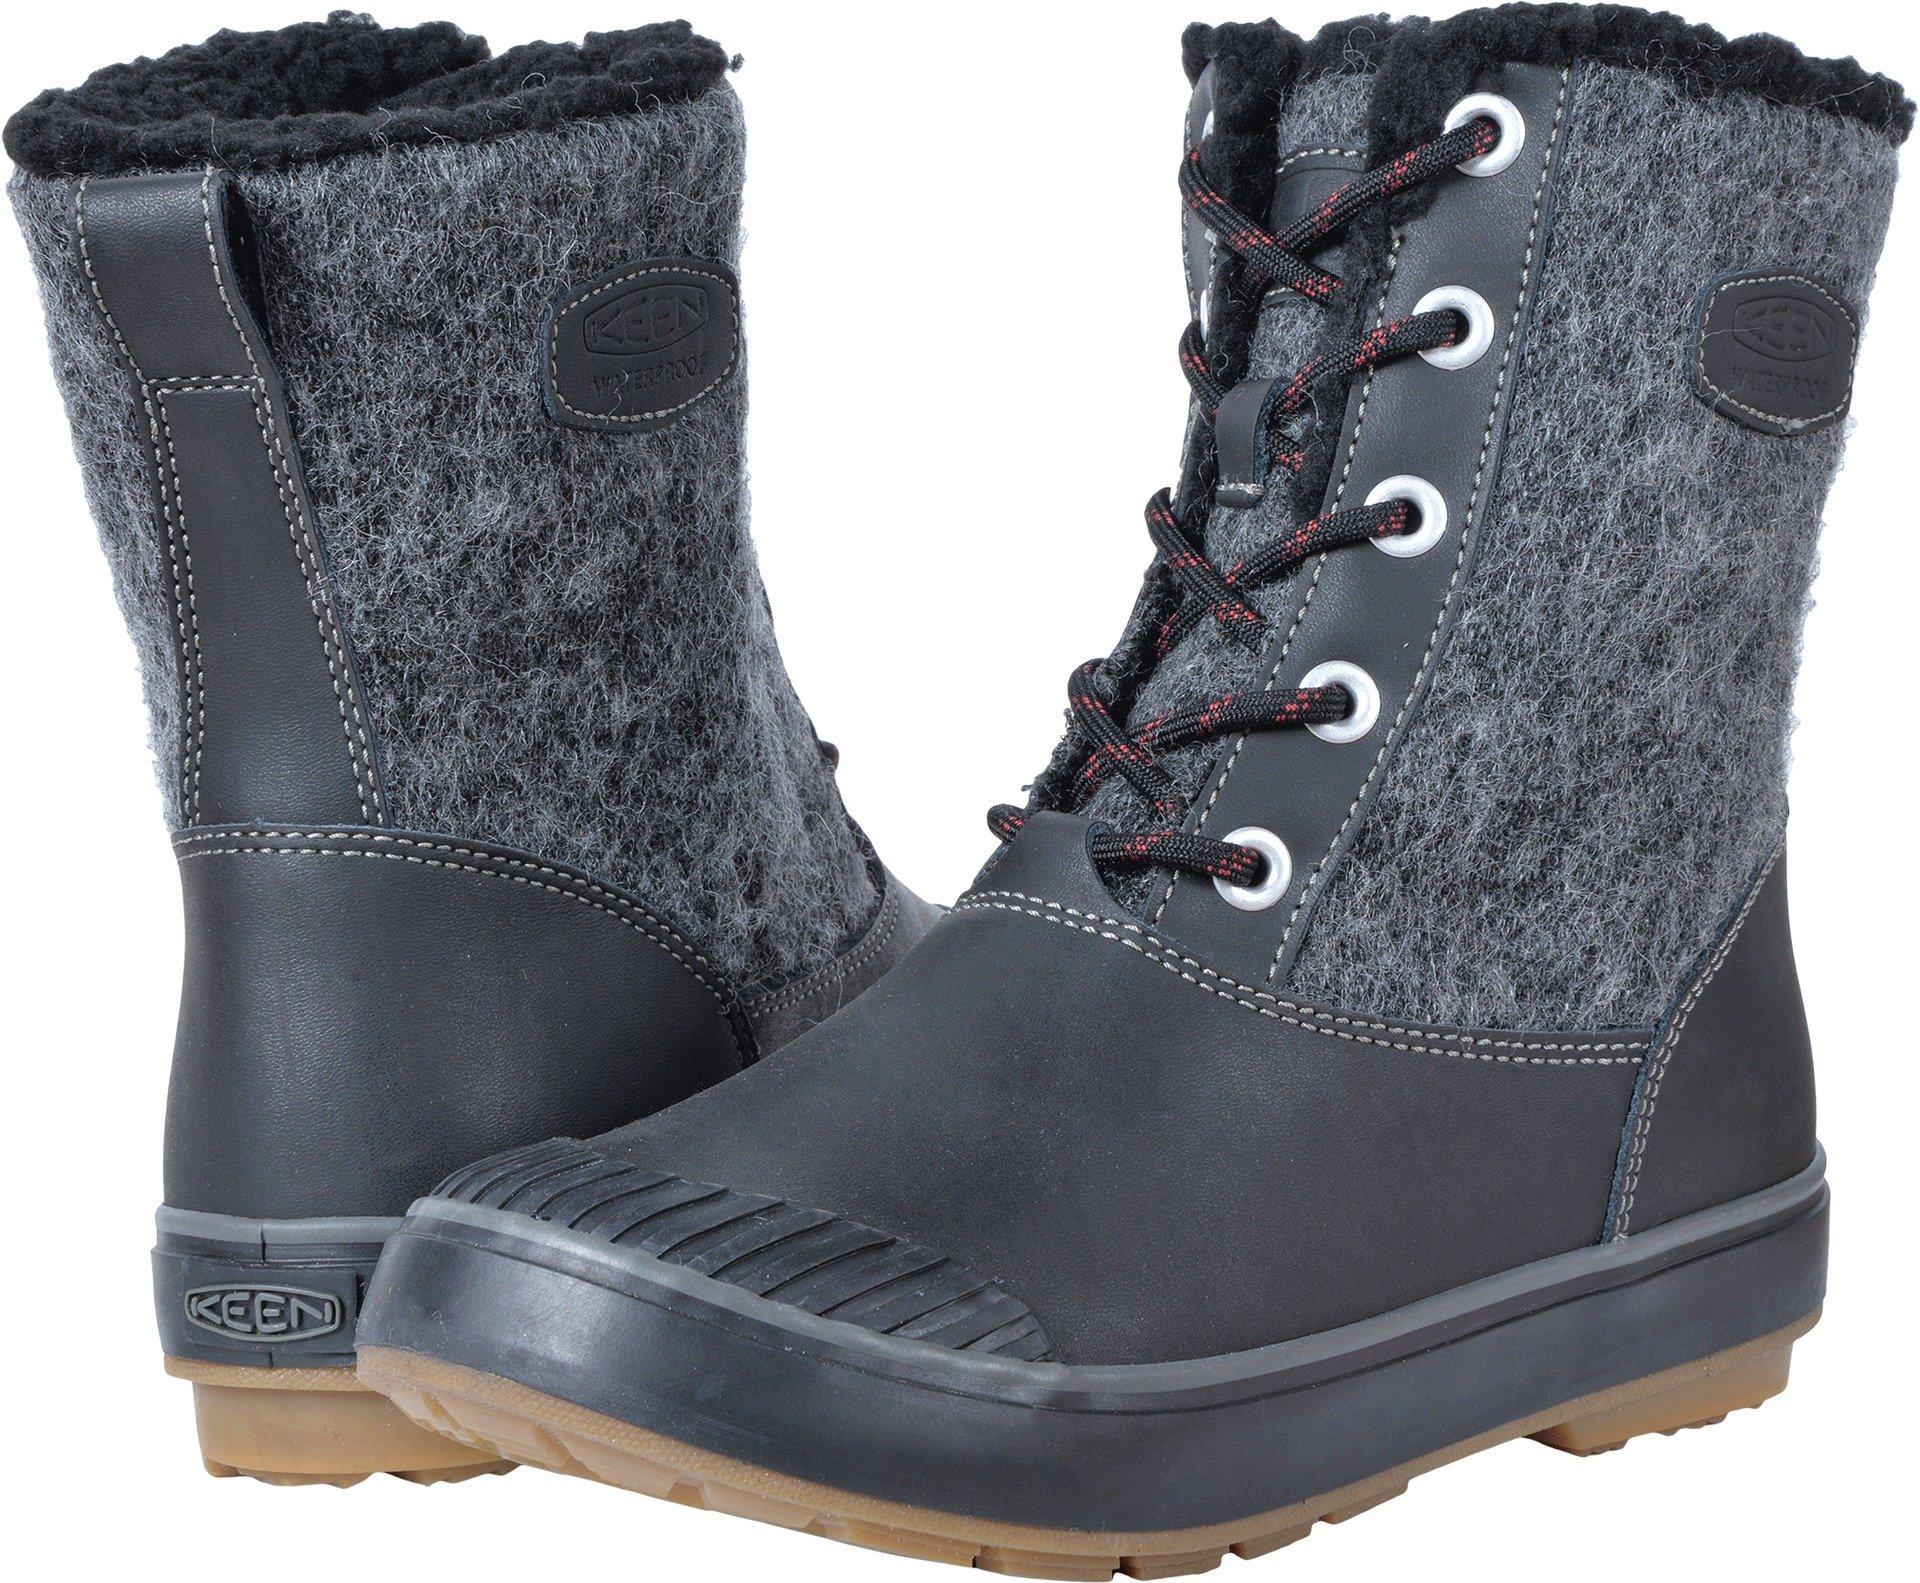 KEEN Women's Elsa WP-w Snow Boot, Black Wool, 9 M US